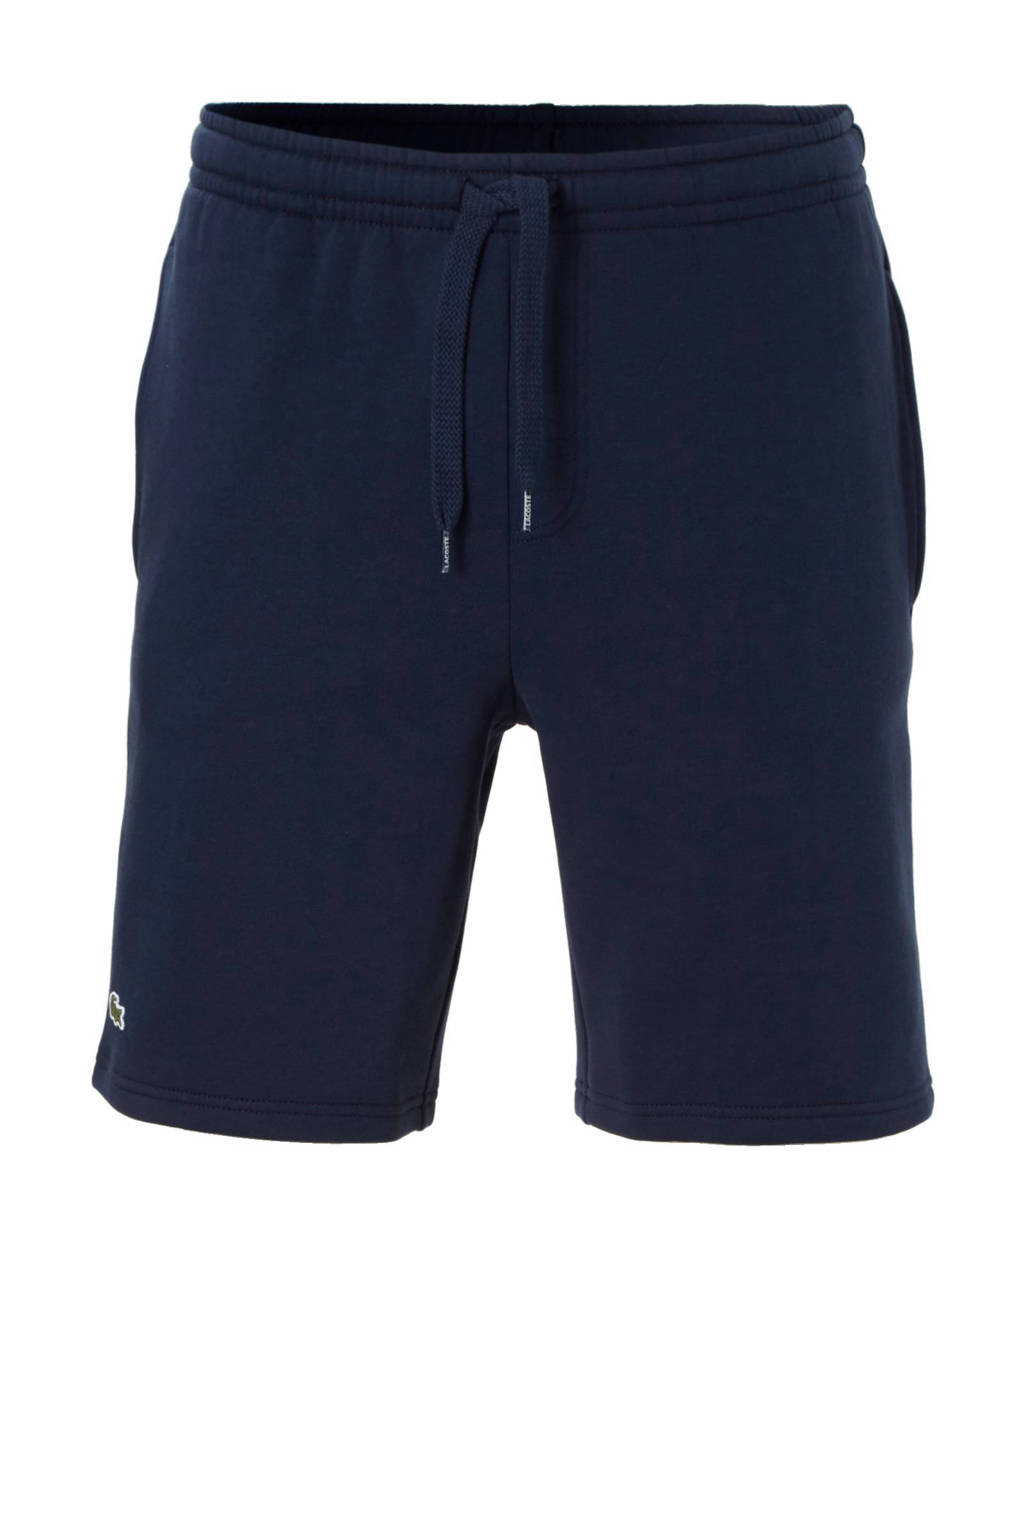 Lacoste   sweatshort, Donkerblauw